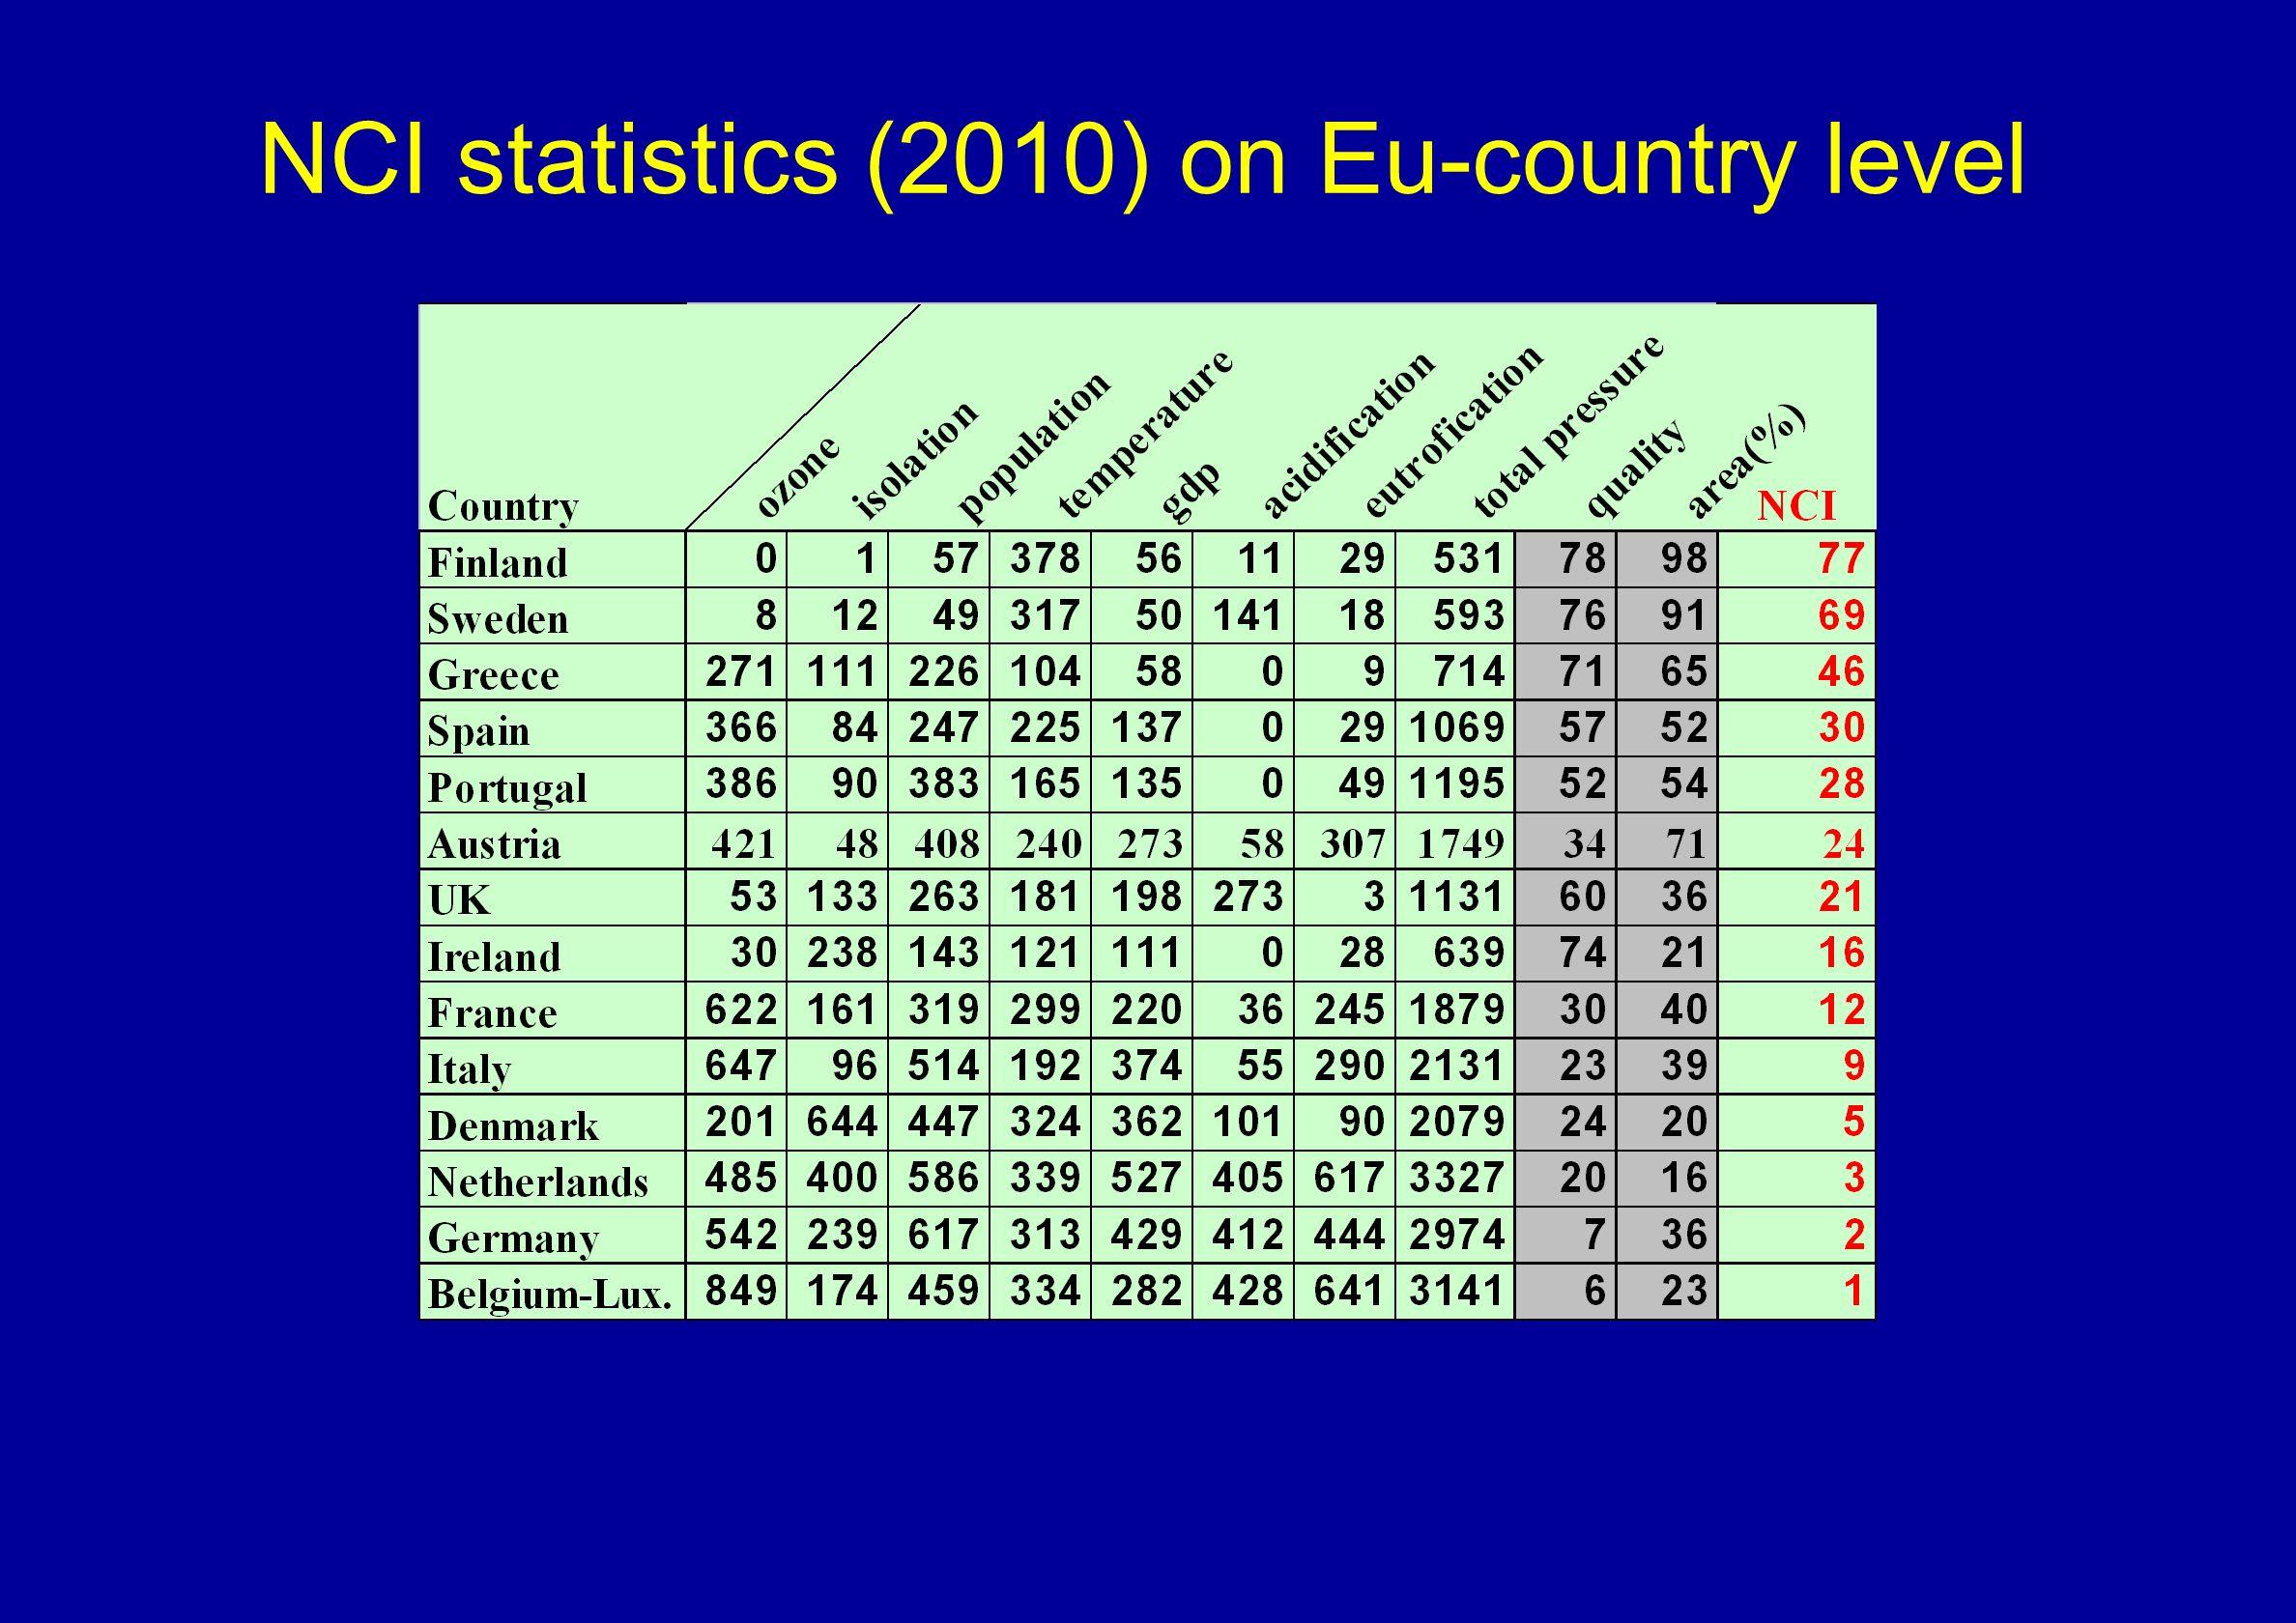 NCI statistics (2010) on Eu-country level